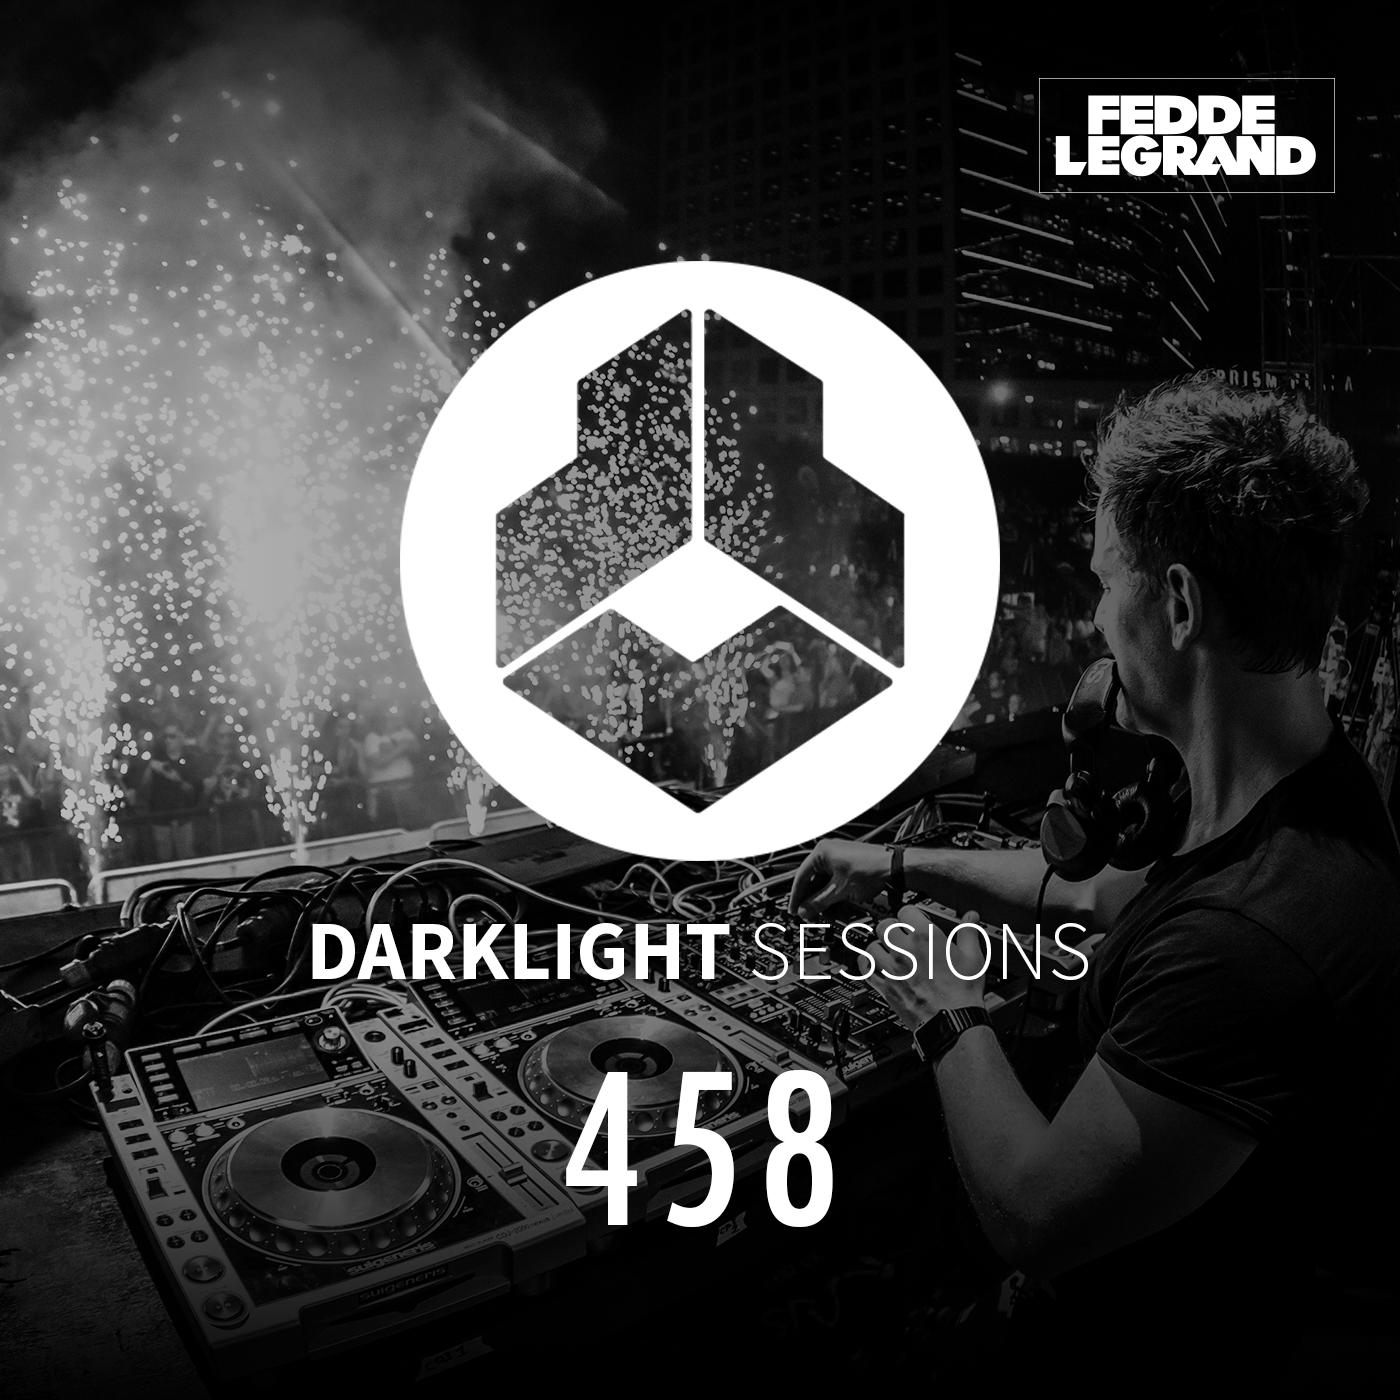 Darklight Sessions 458